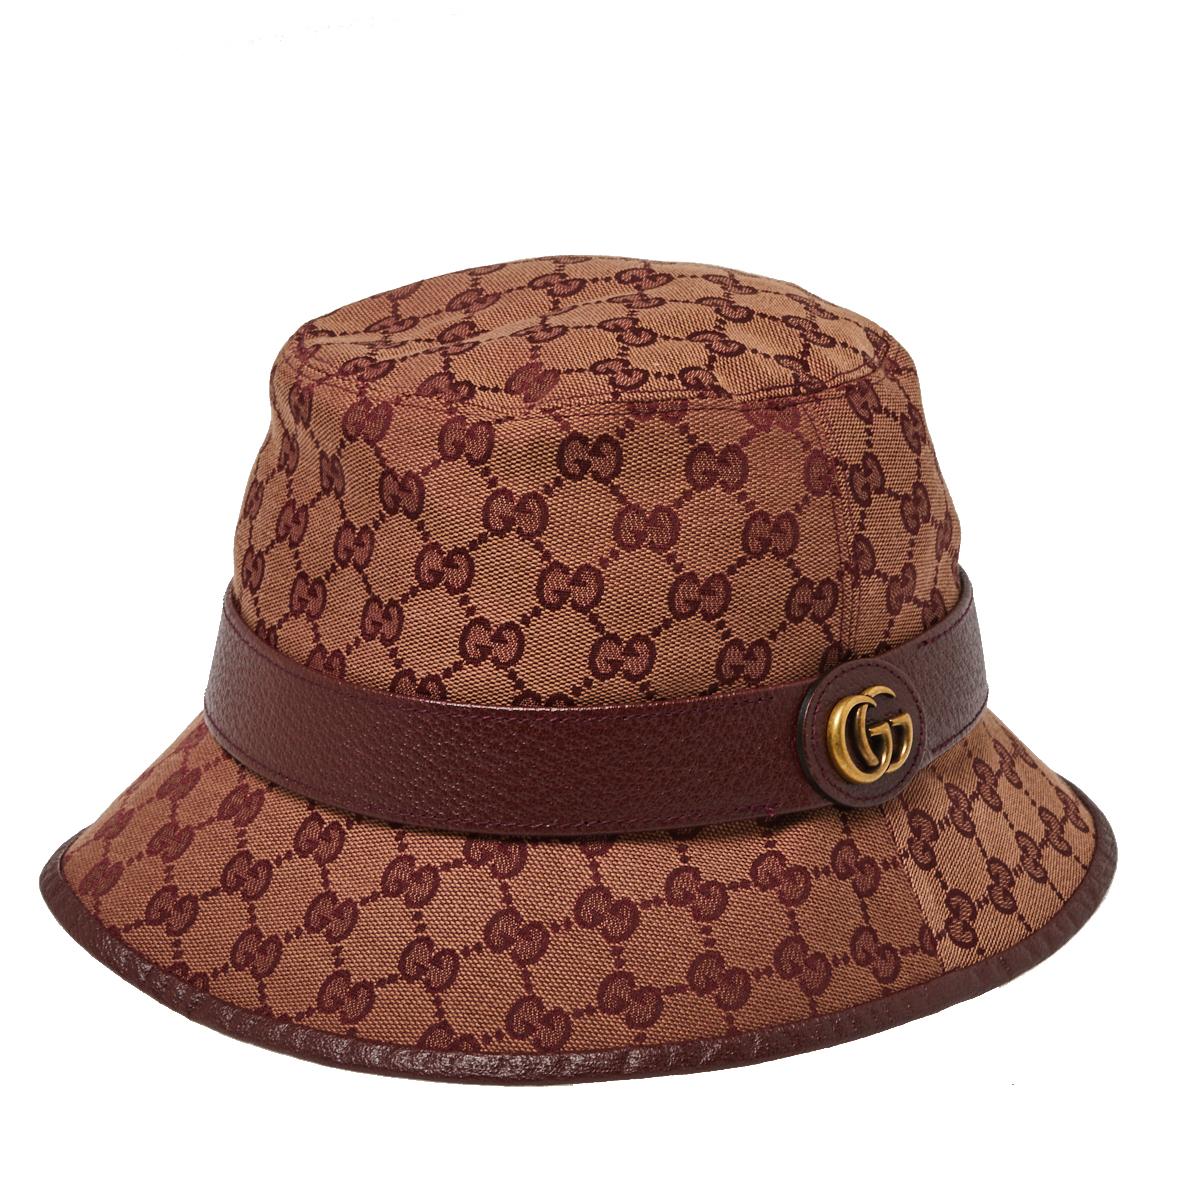 Gucci Burgundy Monogram Canvas Leather Trim Bucket Hat L